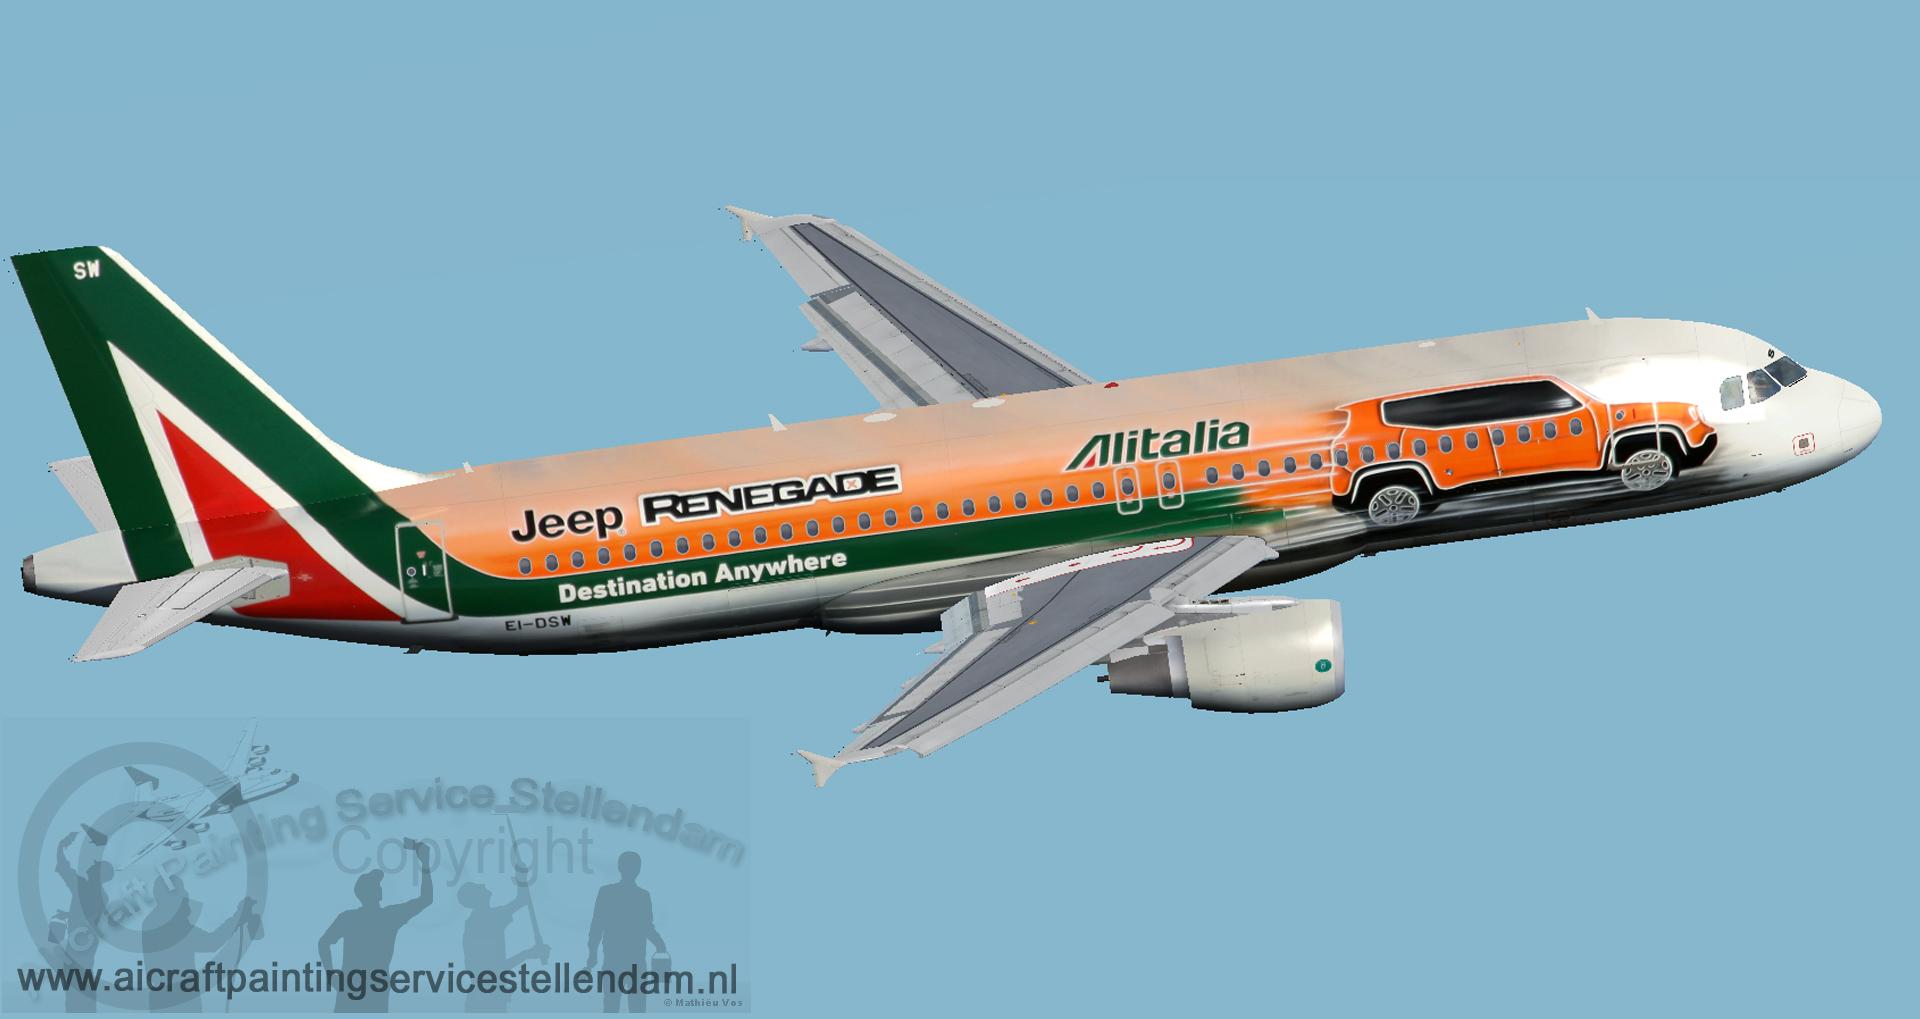 ProjectAirbusA320-214Alitalia_JeepRenegade_EI-DSW3